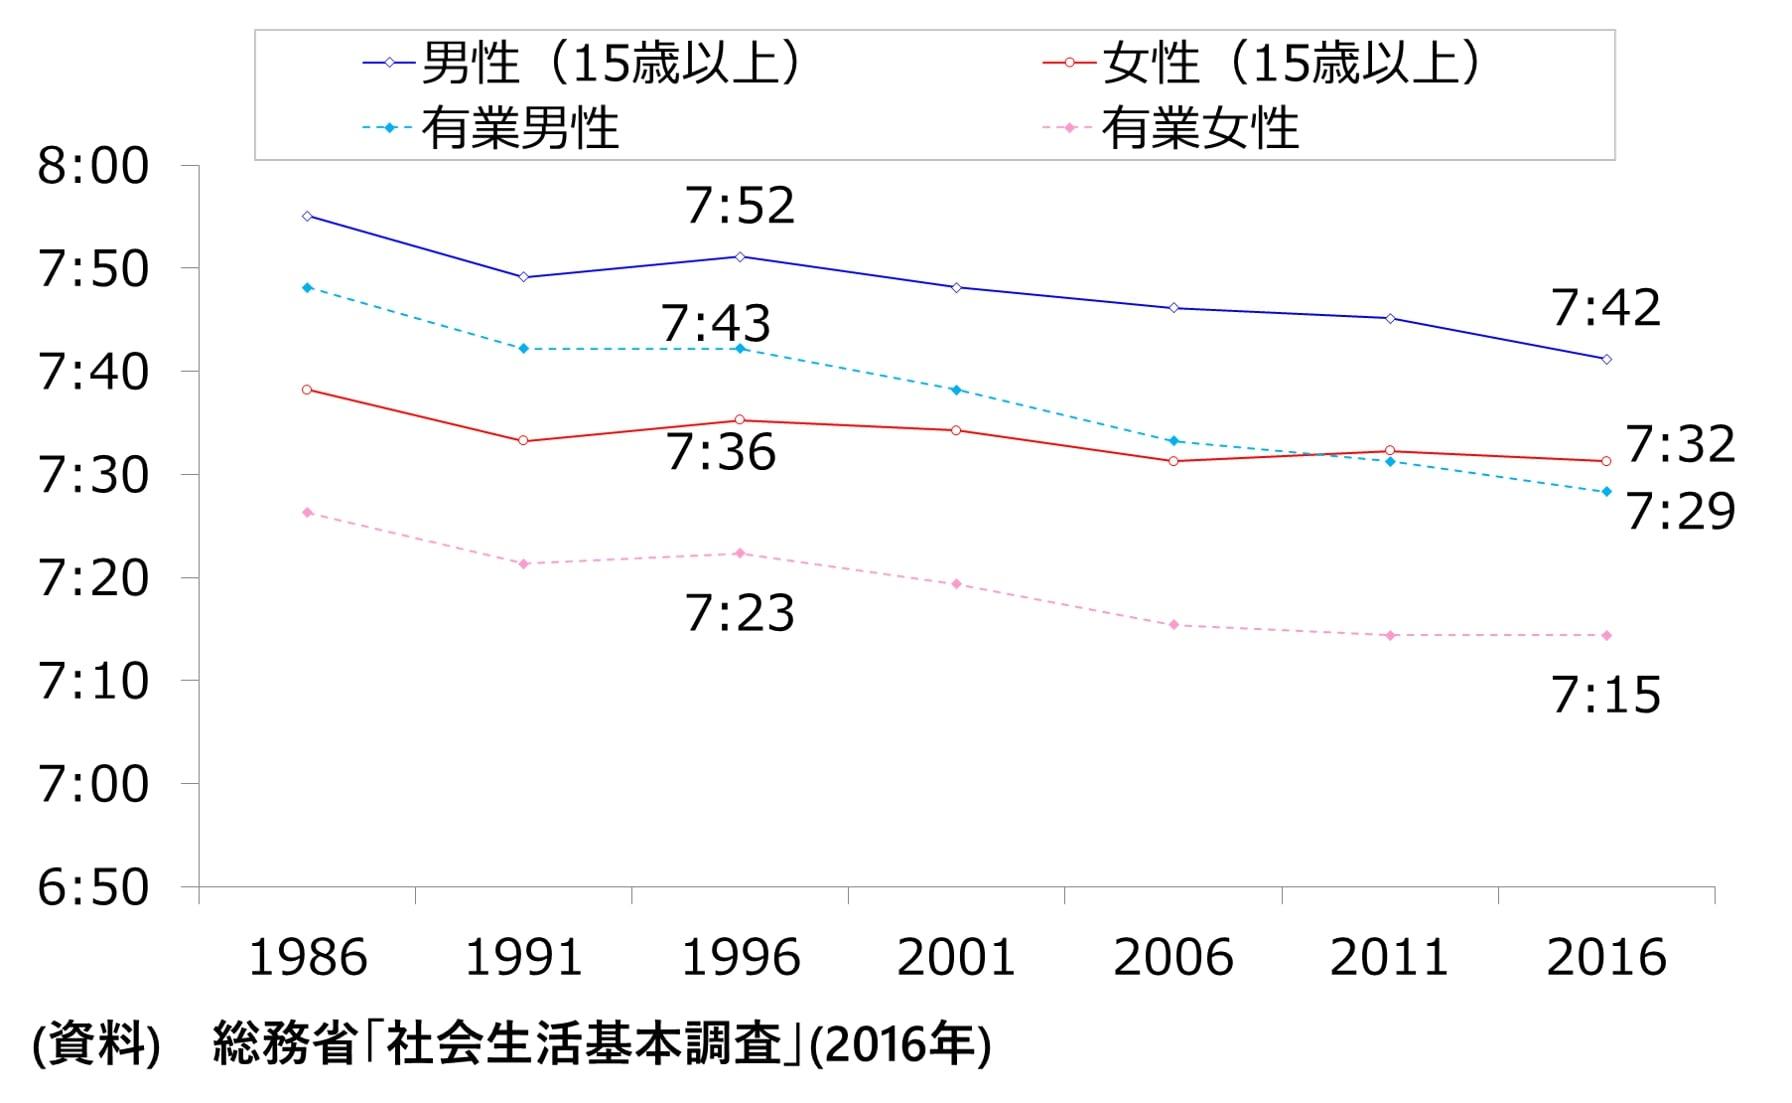 図 男女・有業男女の平均睡眠時間の推移